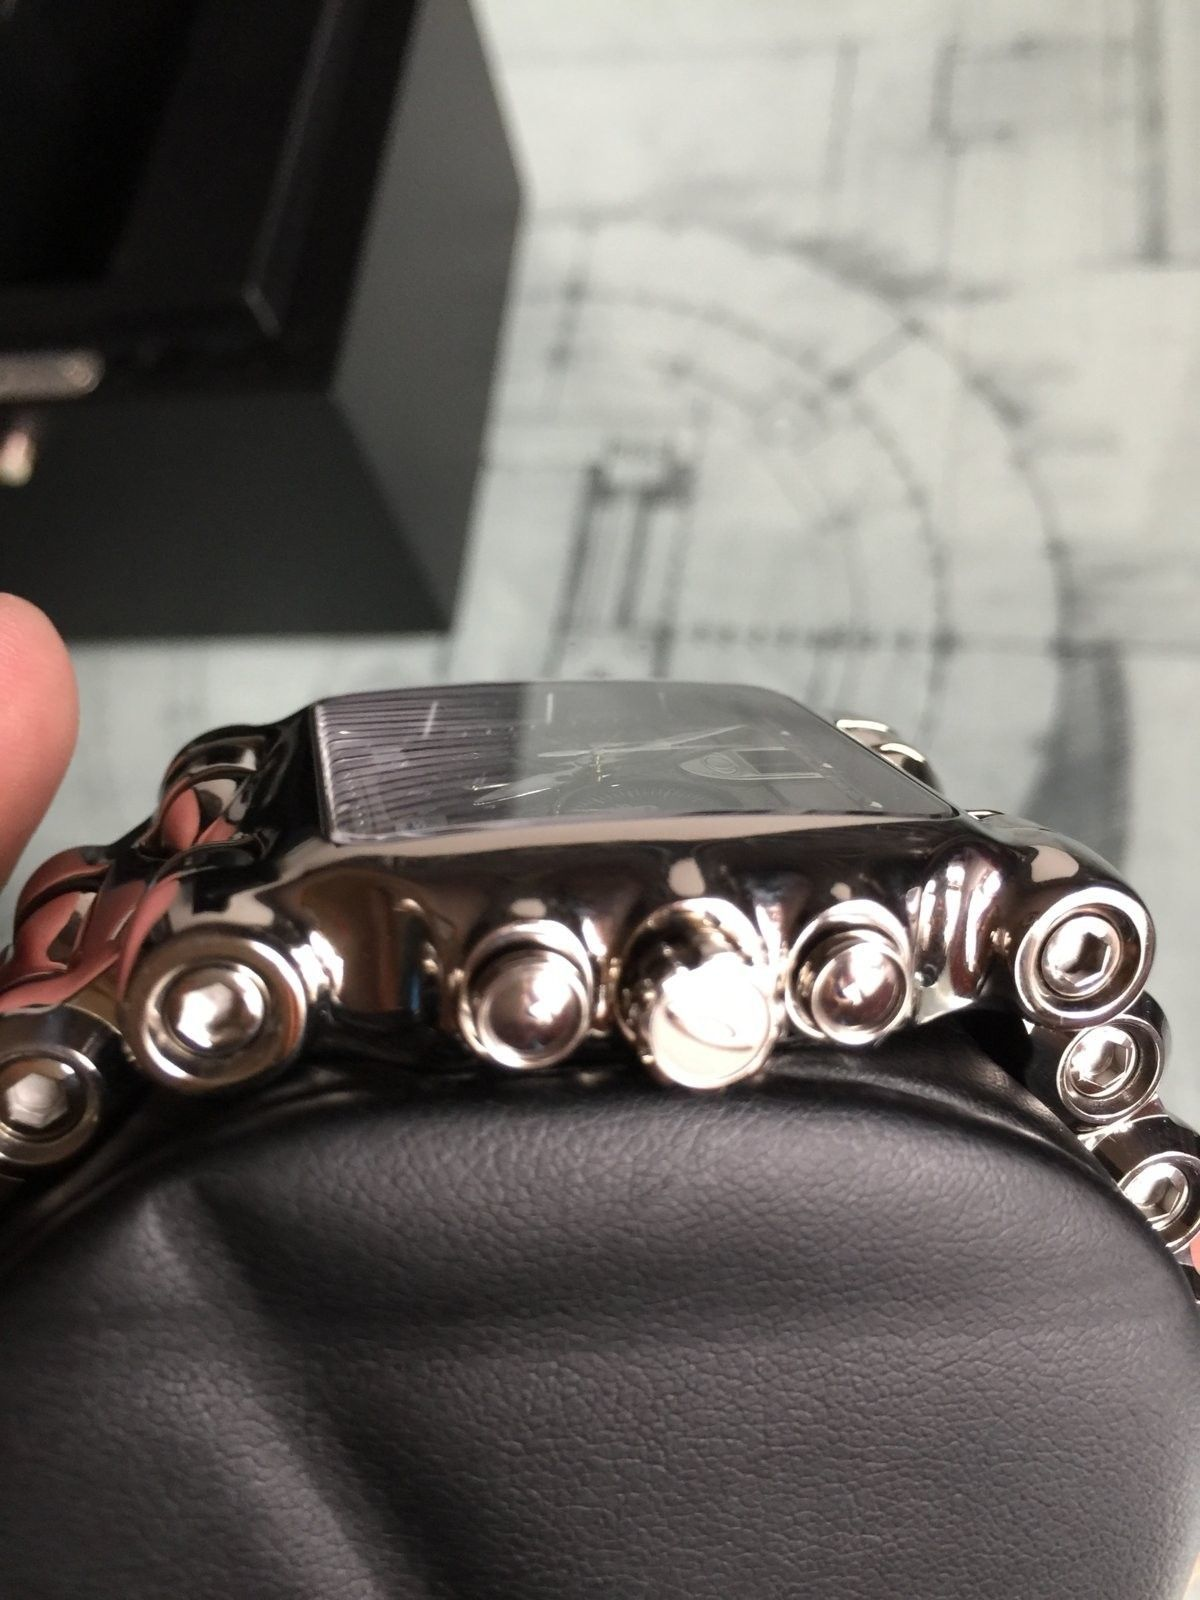 LNIB Polished Black Dial Minute Machine watch - IMG_6078.JPG